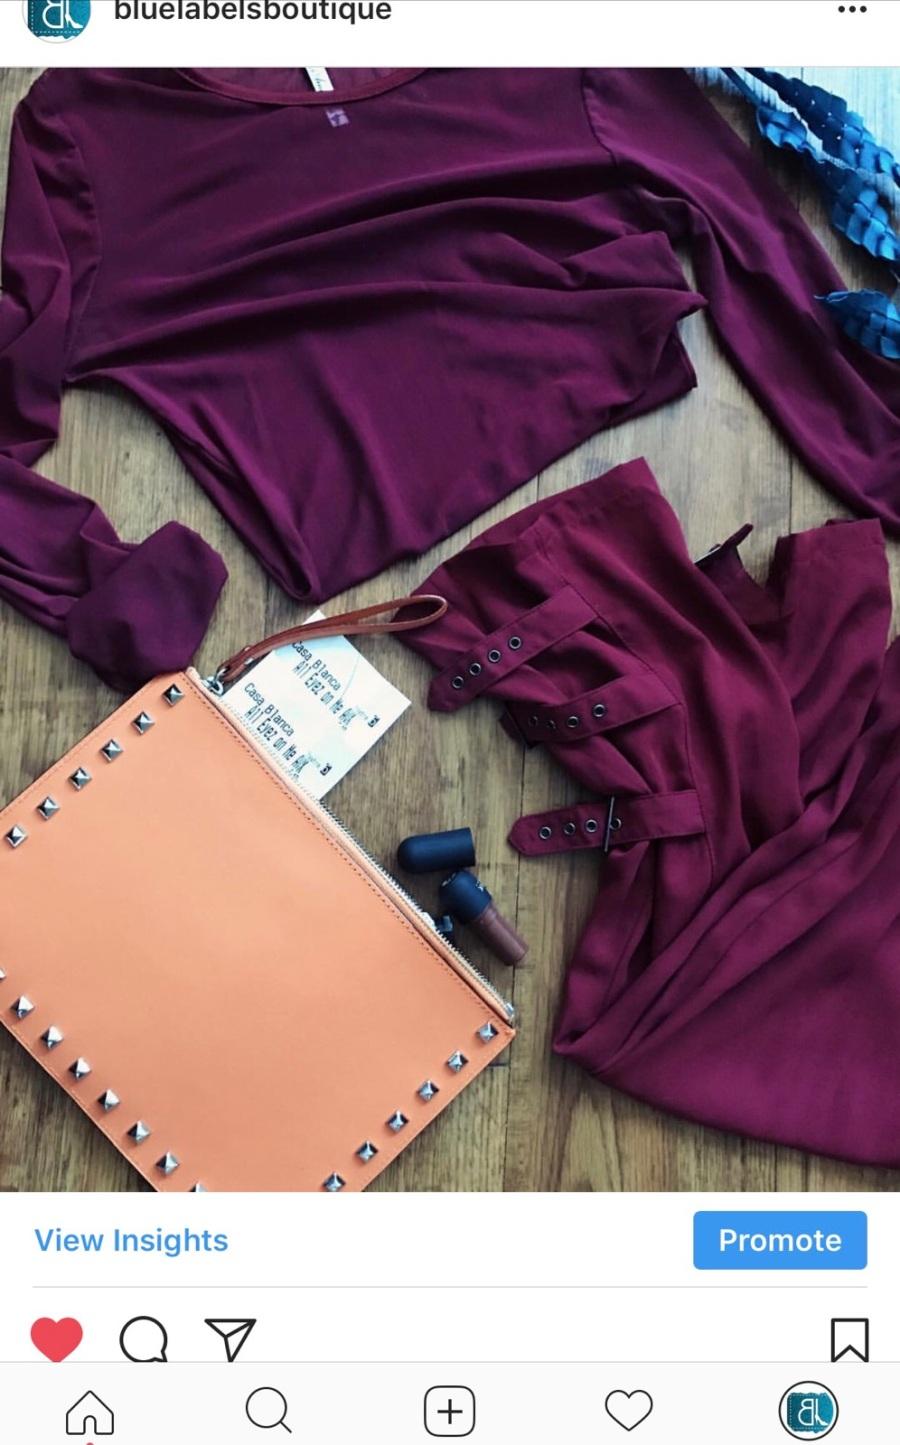 burgundy top, burgundy pants, orange clutch, blue labels boutique